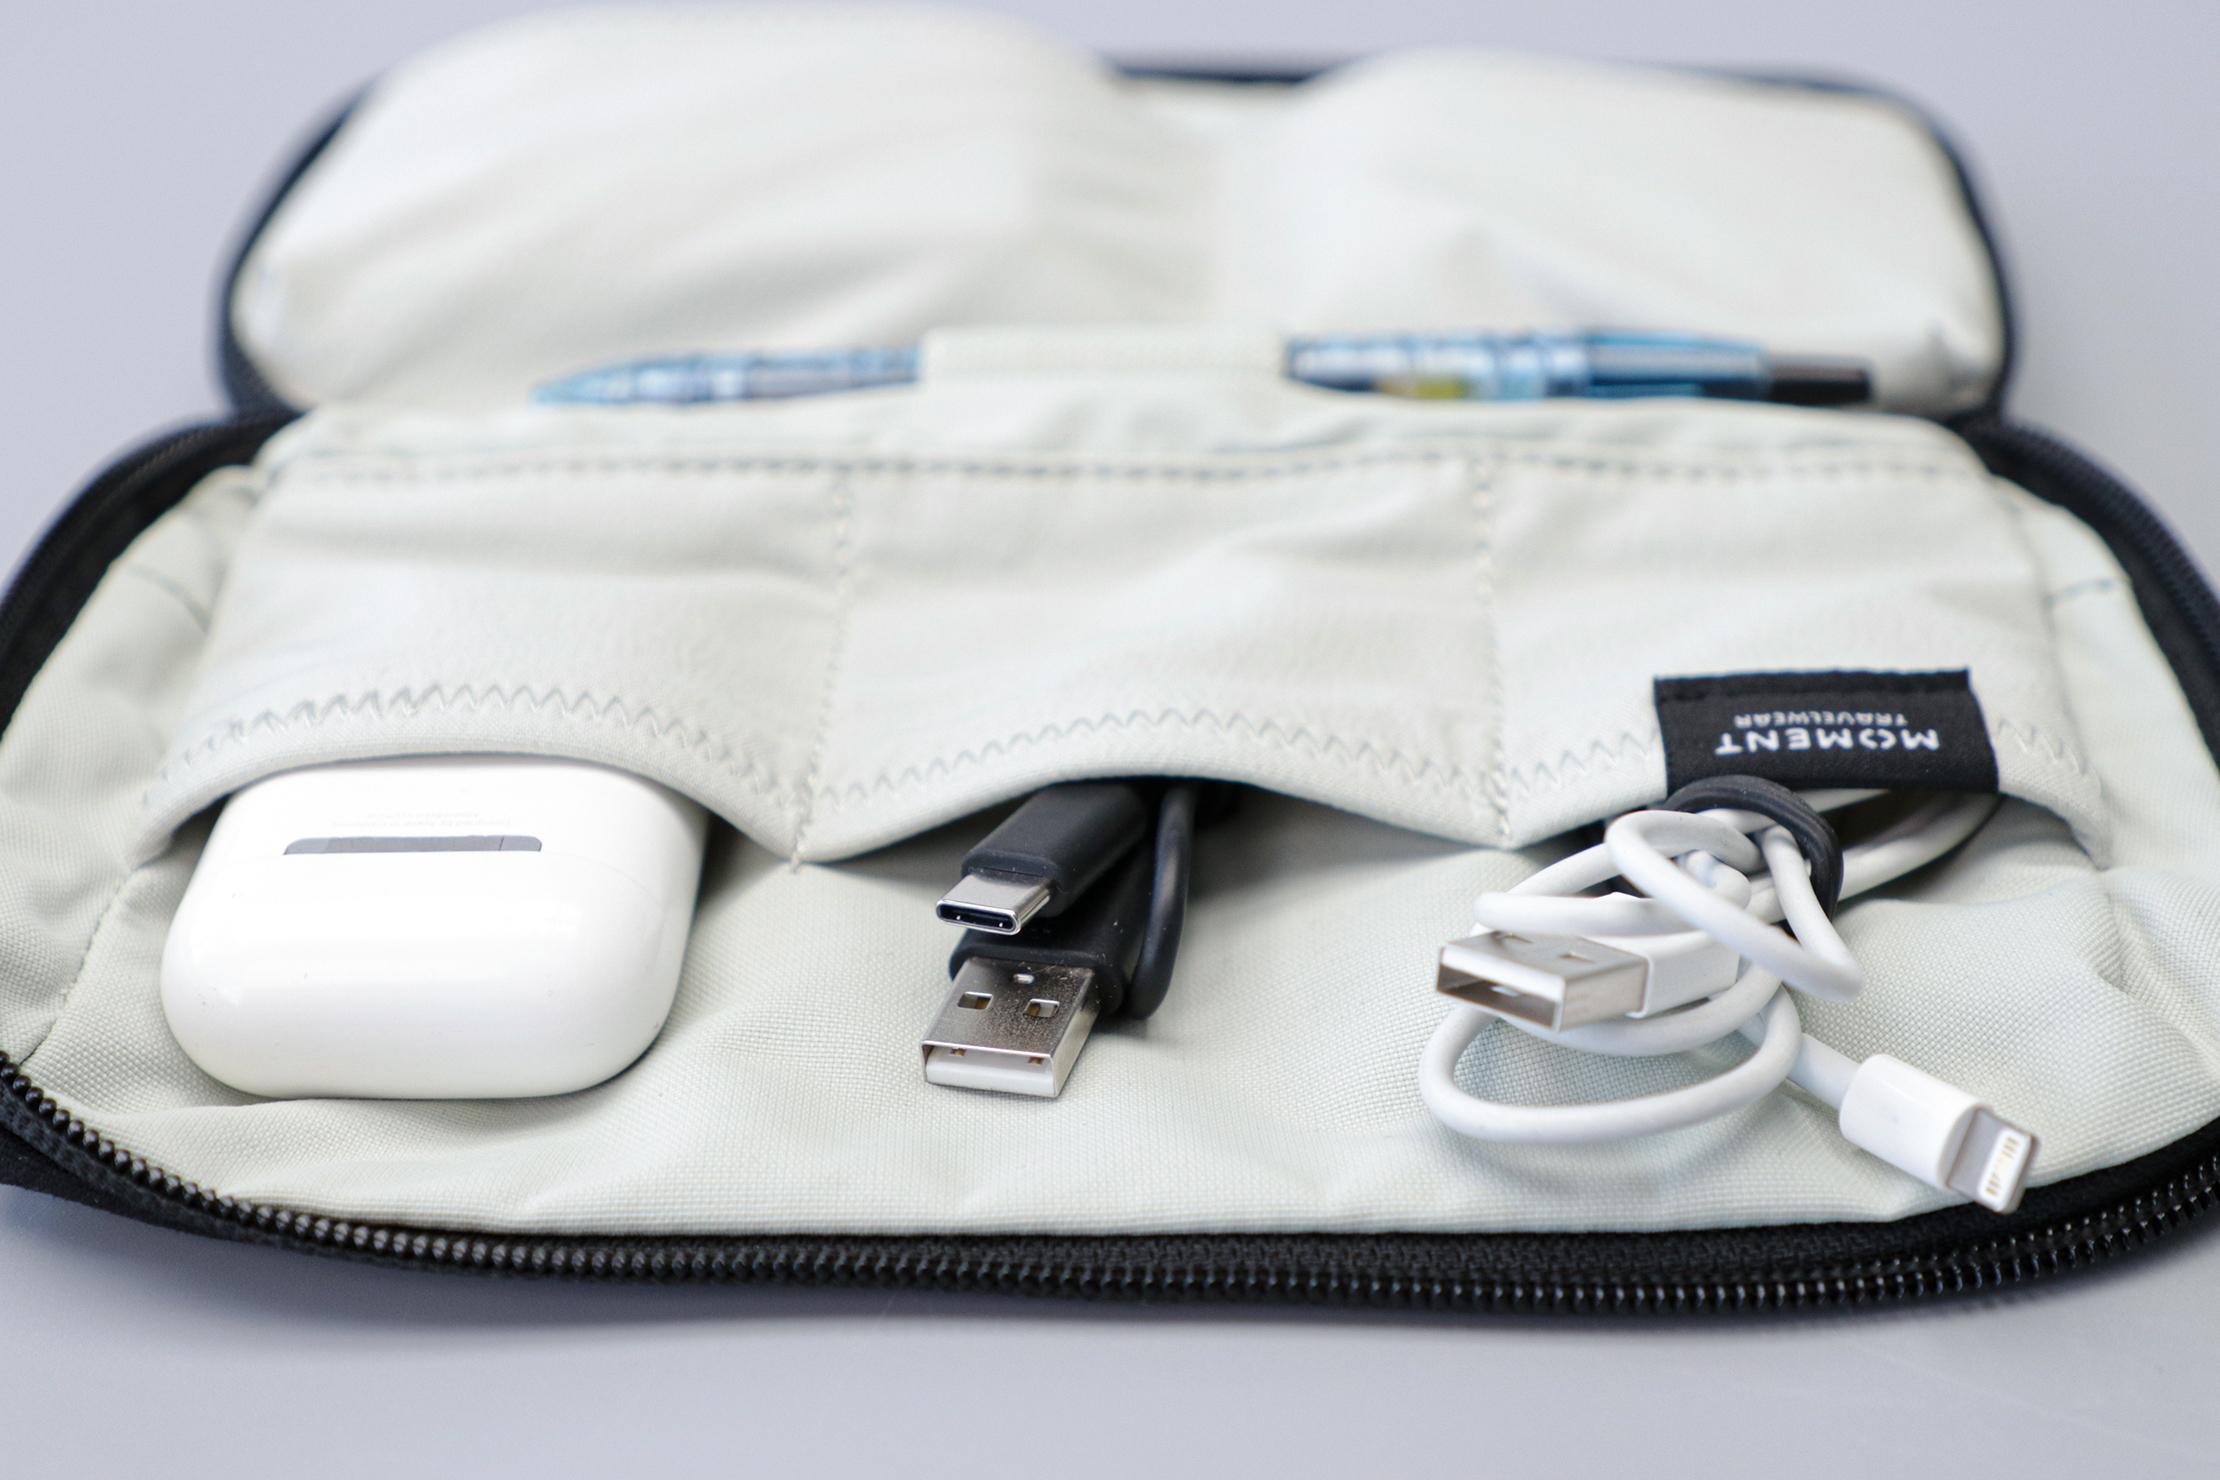 Moment MTW Tech Organizer Mini Pockets